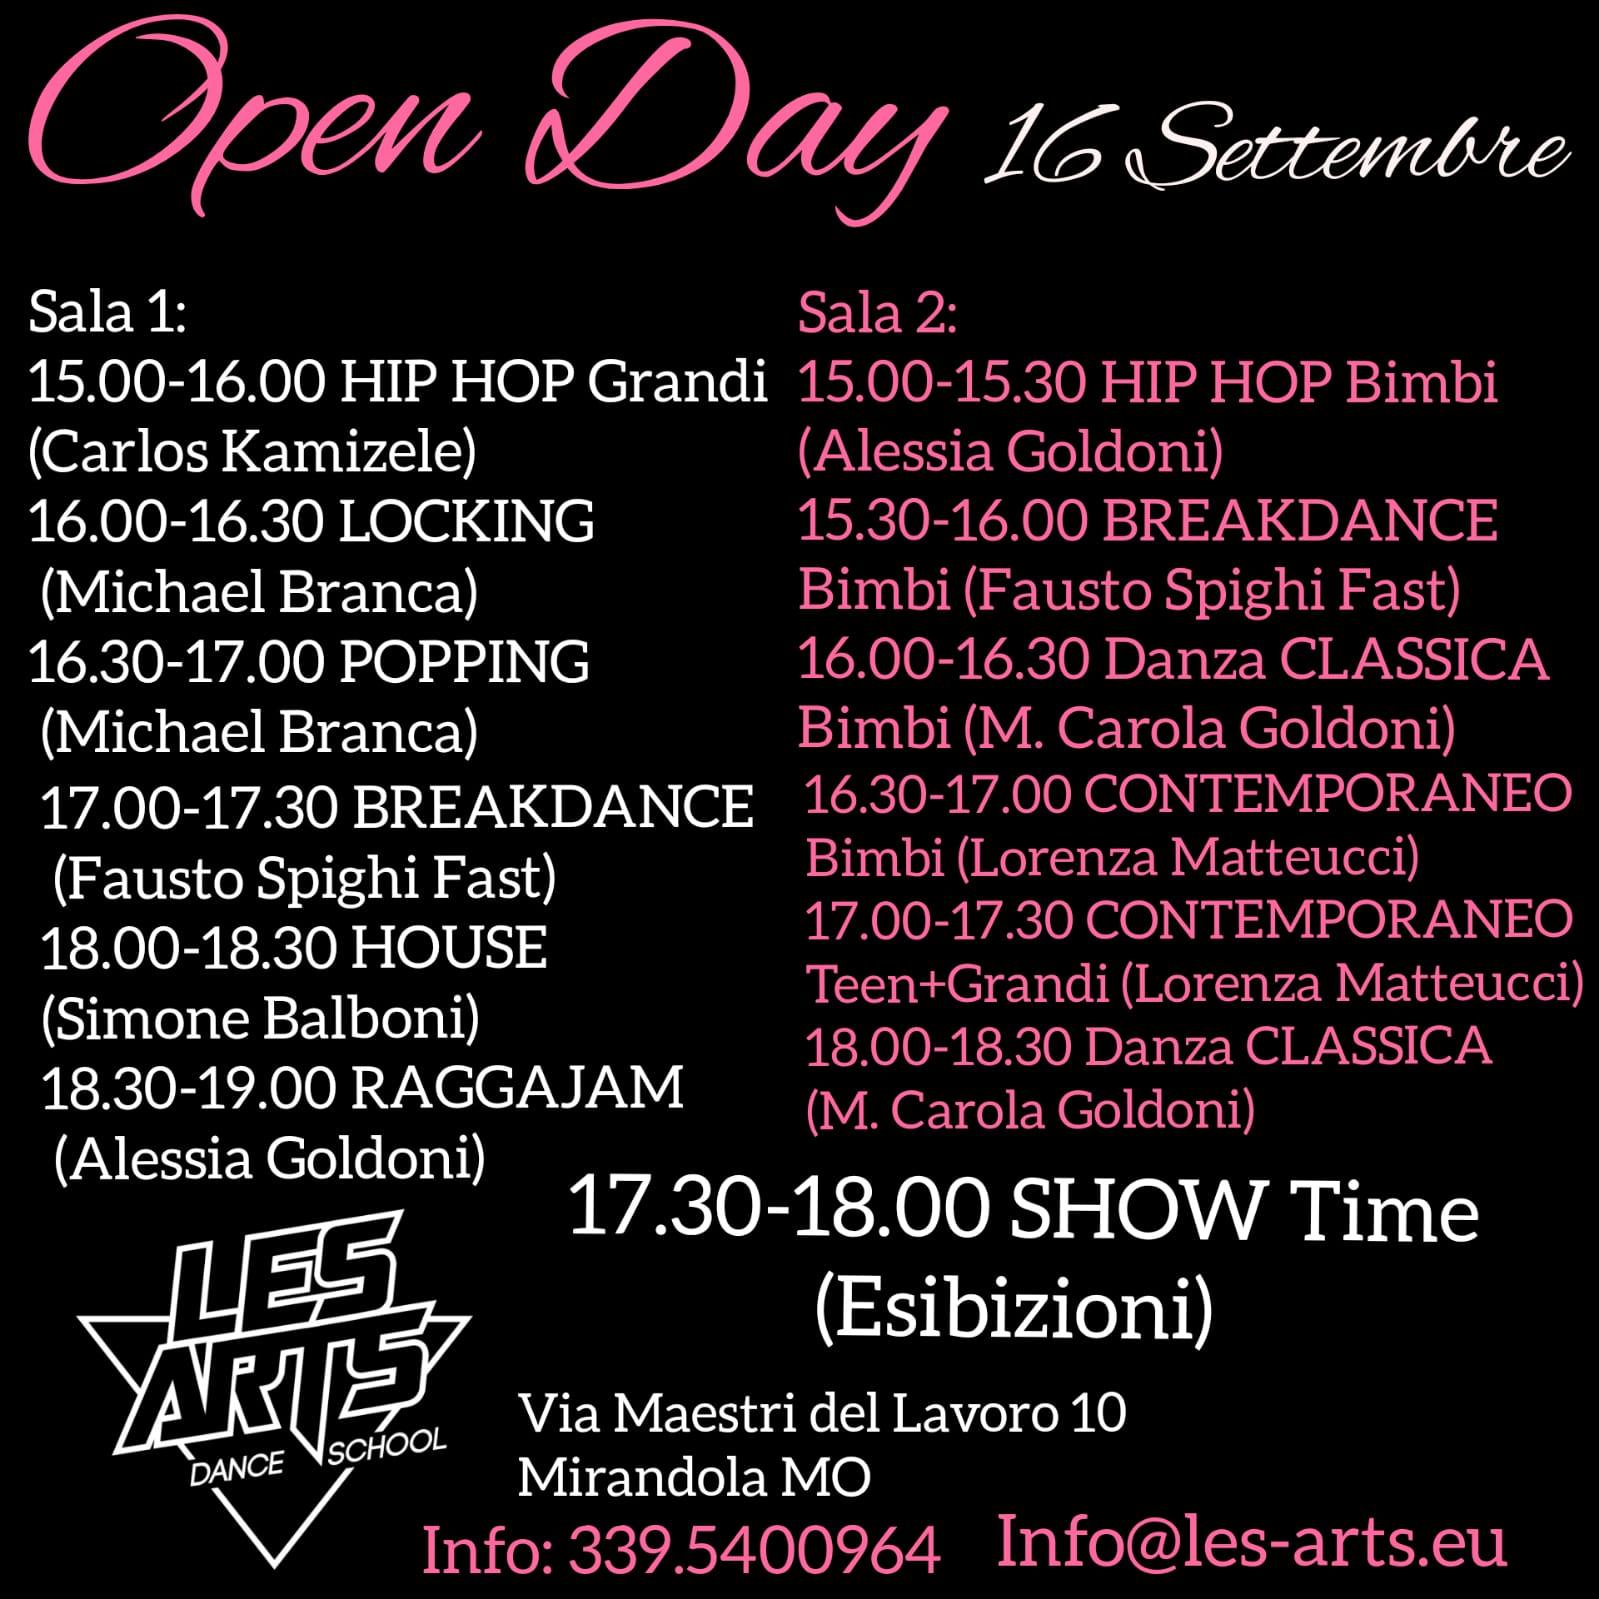 2018 09 16 open day les art